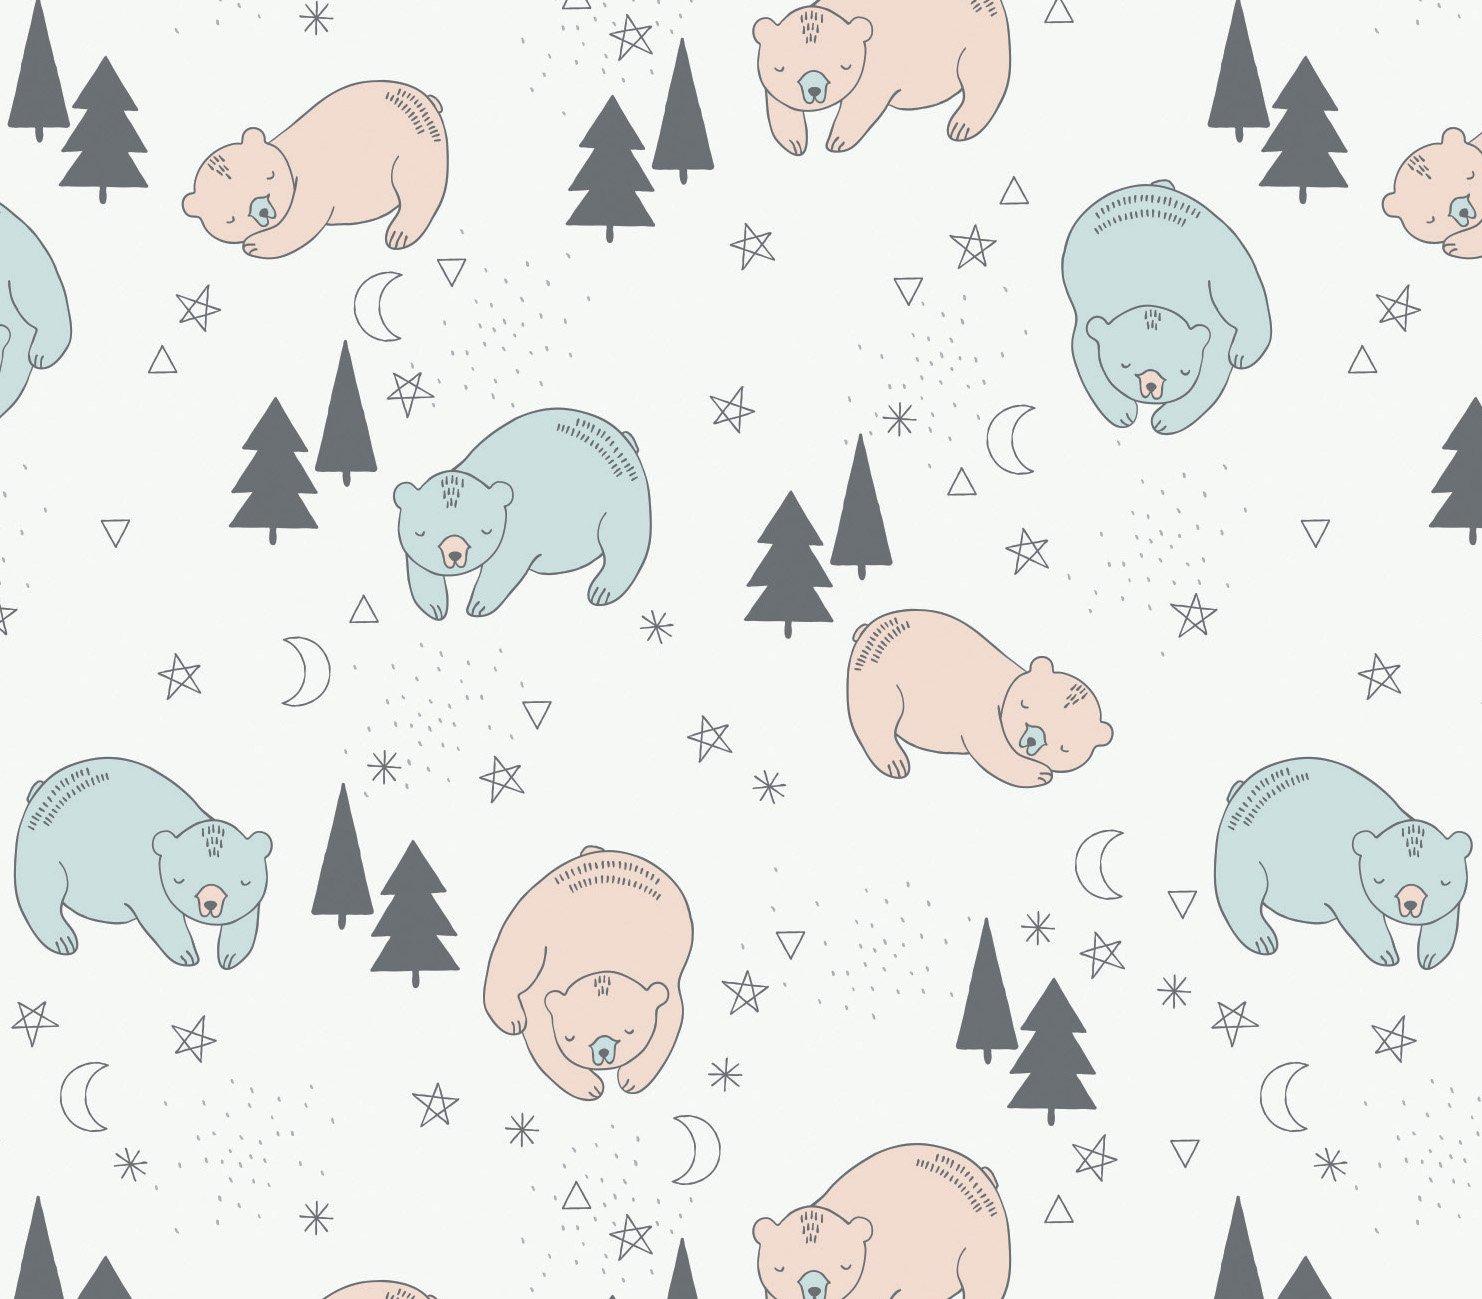 Bonne Nuit. Sleeping Bears in White